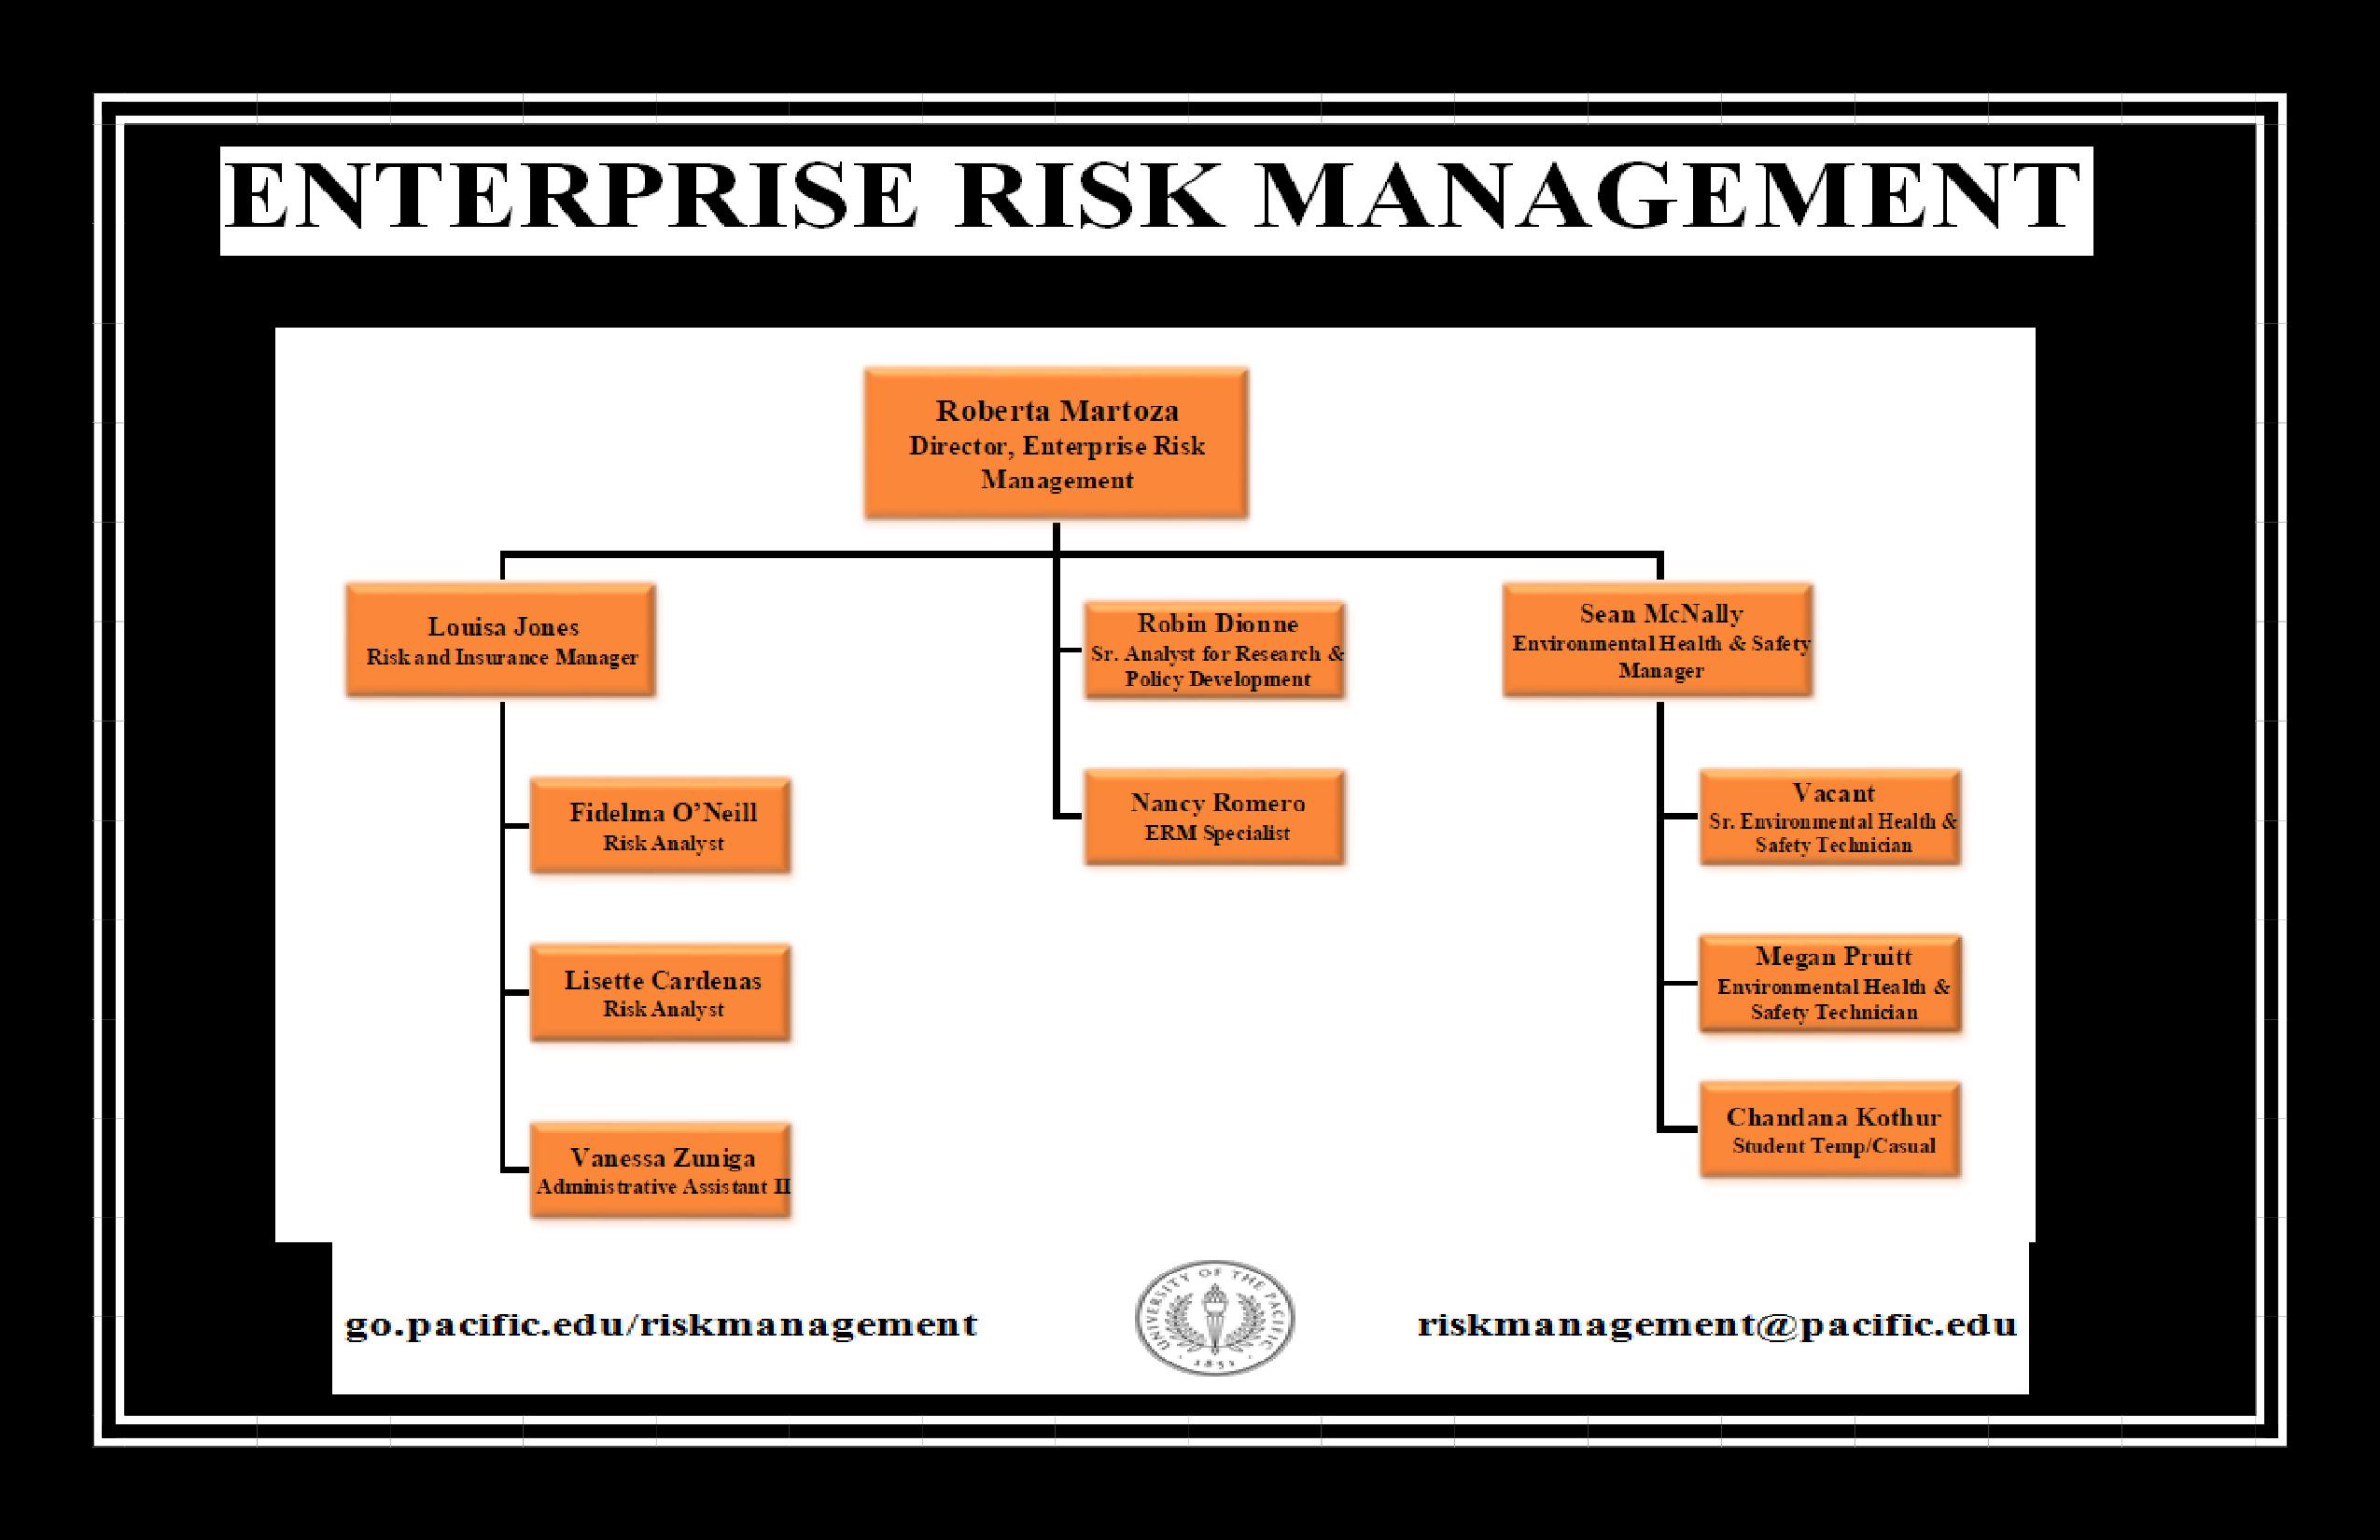 Free Enterprise Risk Management Organizational Chart Templates At